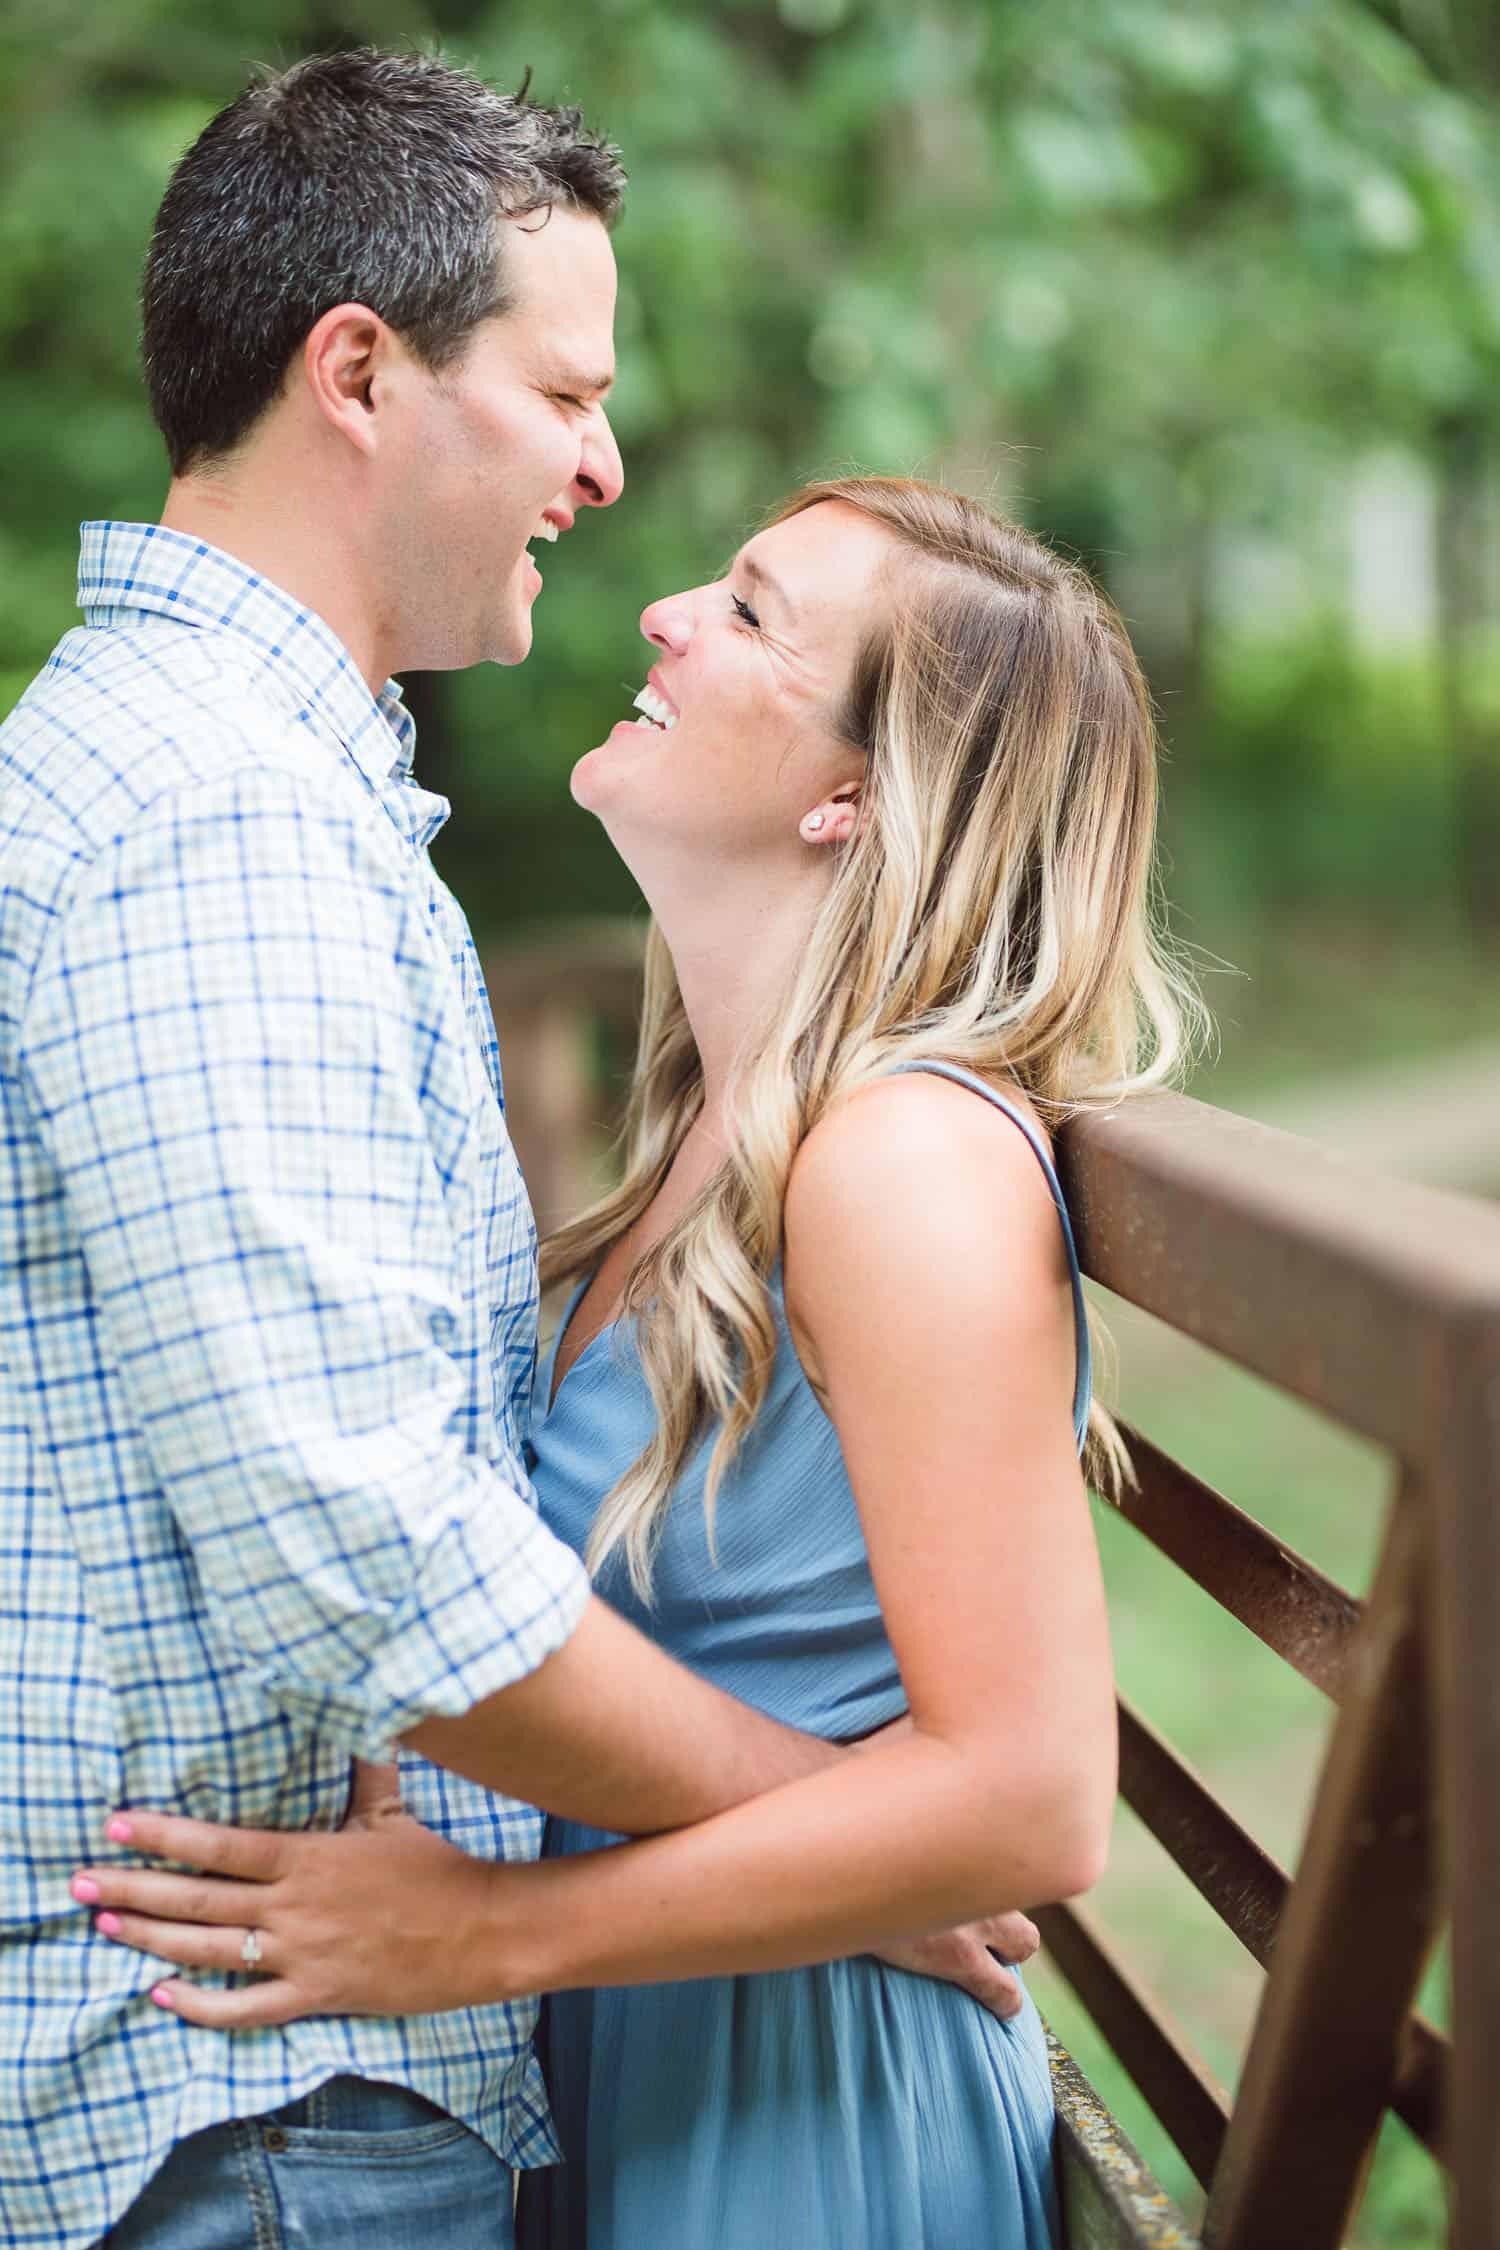 Antioch Park Spring engagement session in Overland Park Kansas